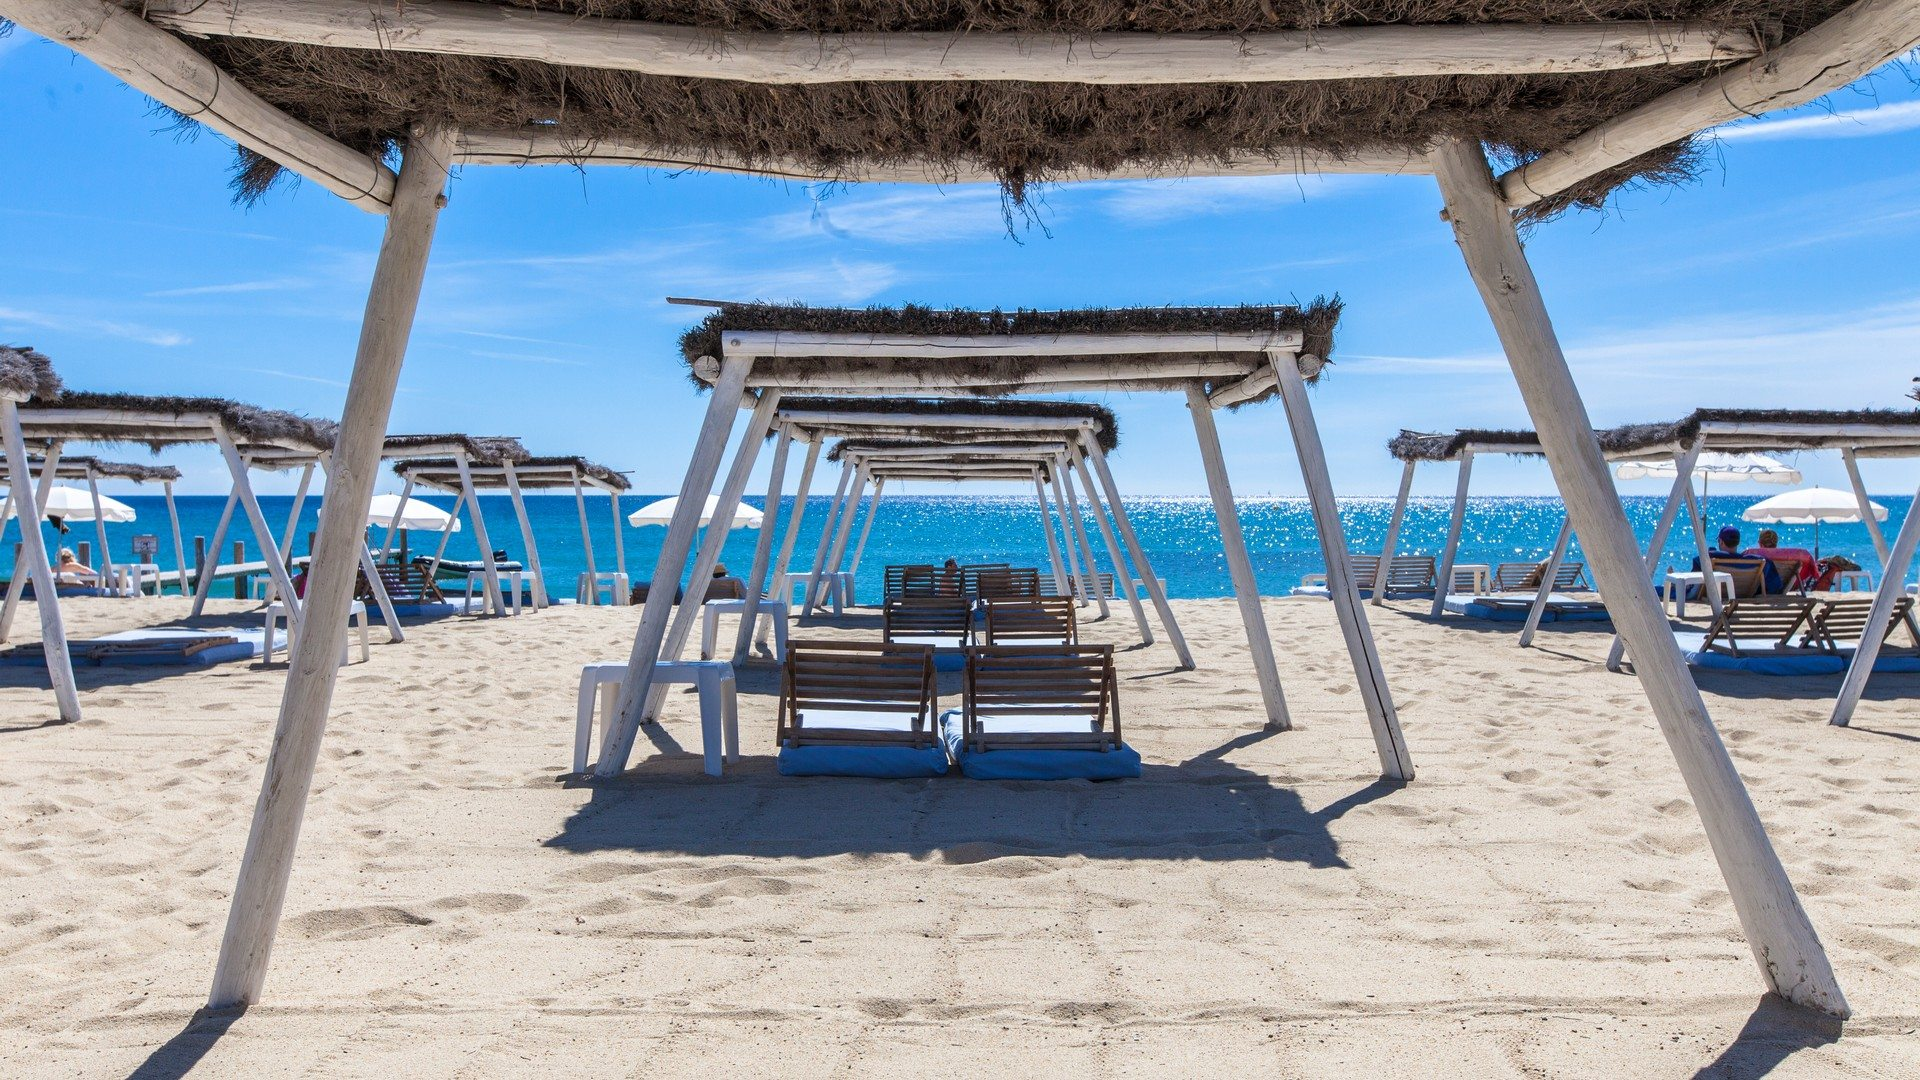 Club-55-Pampelonne-Beach-bar-st-tropex-cote-d-azure